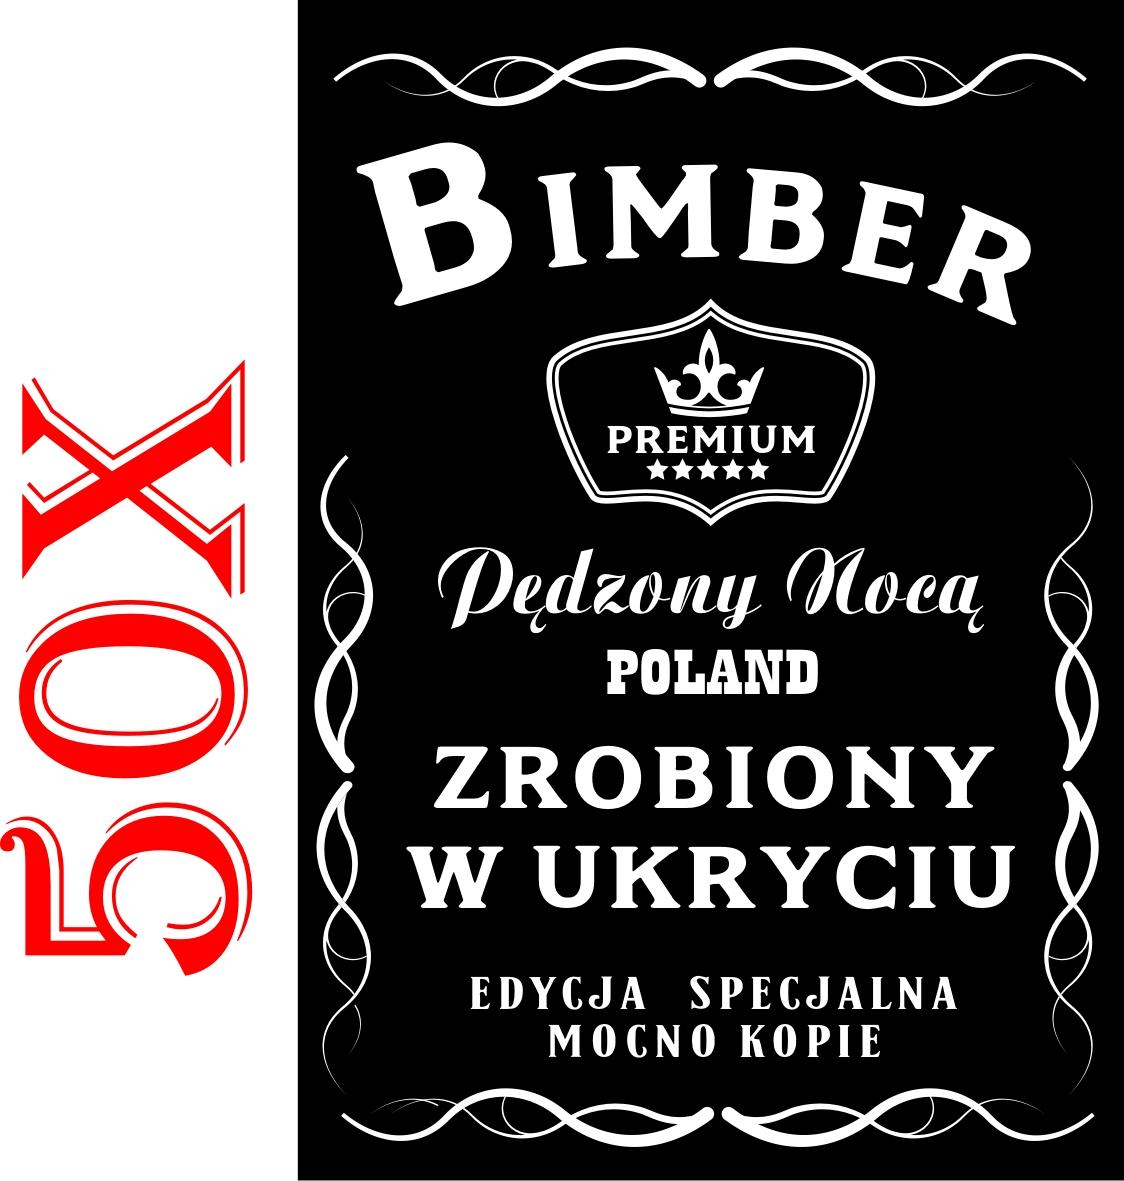 50 Etykiety Na Bimber Wodke Naklejki Alkohol